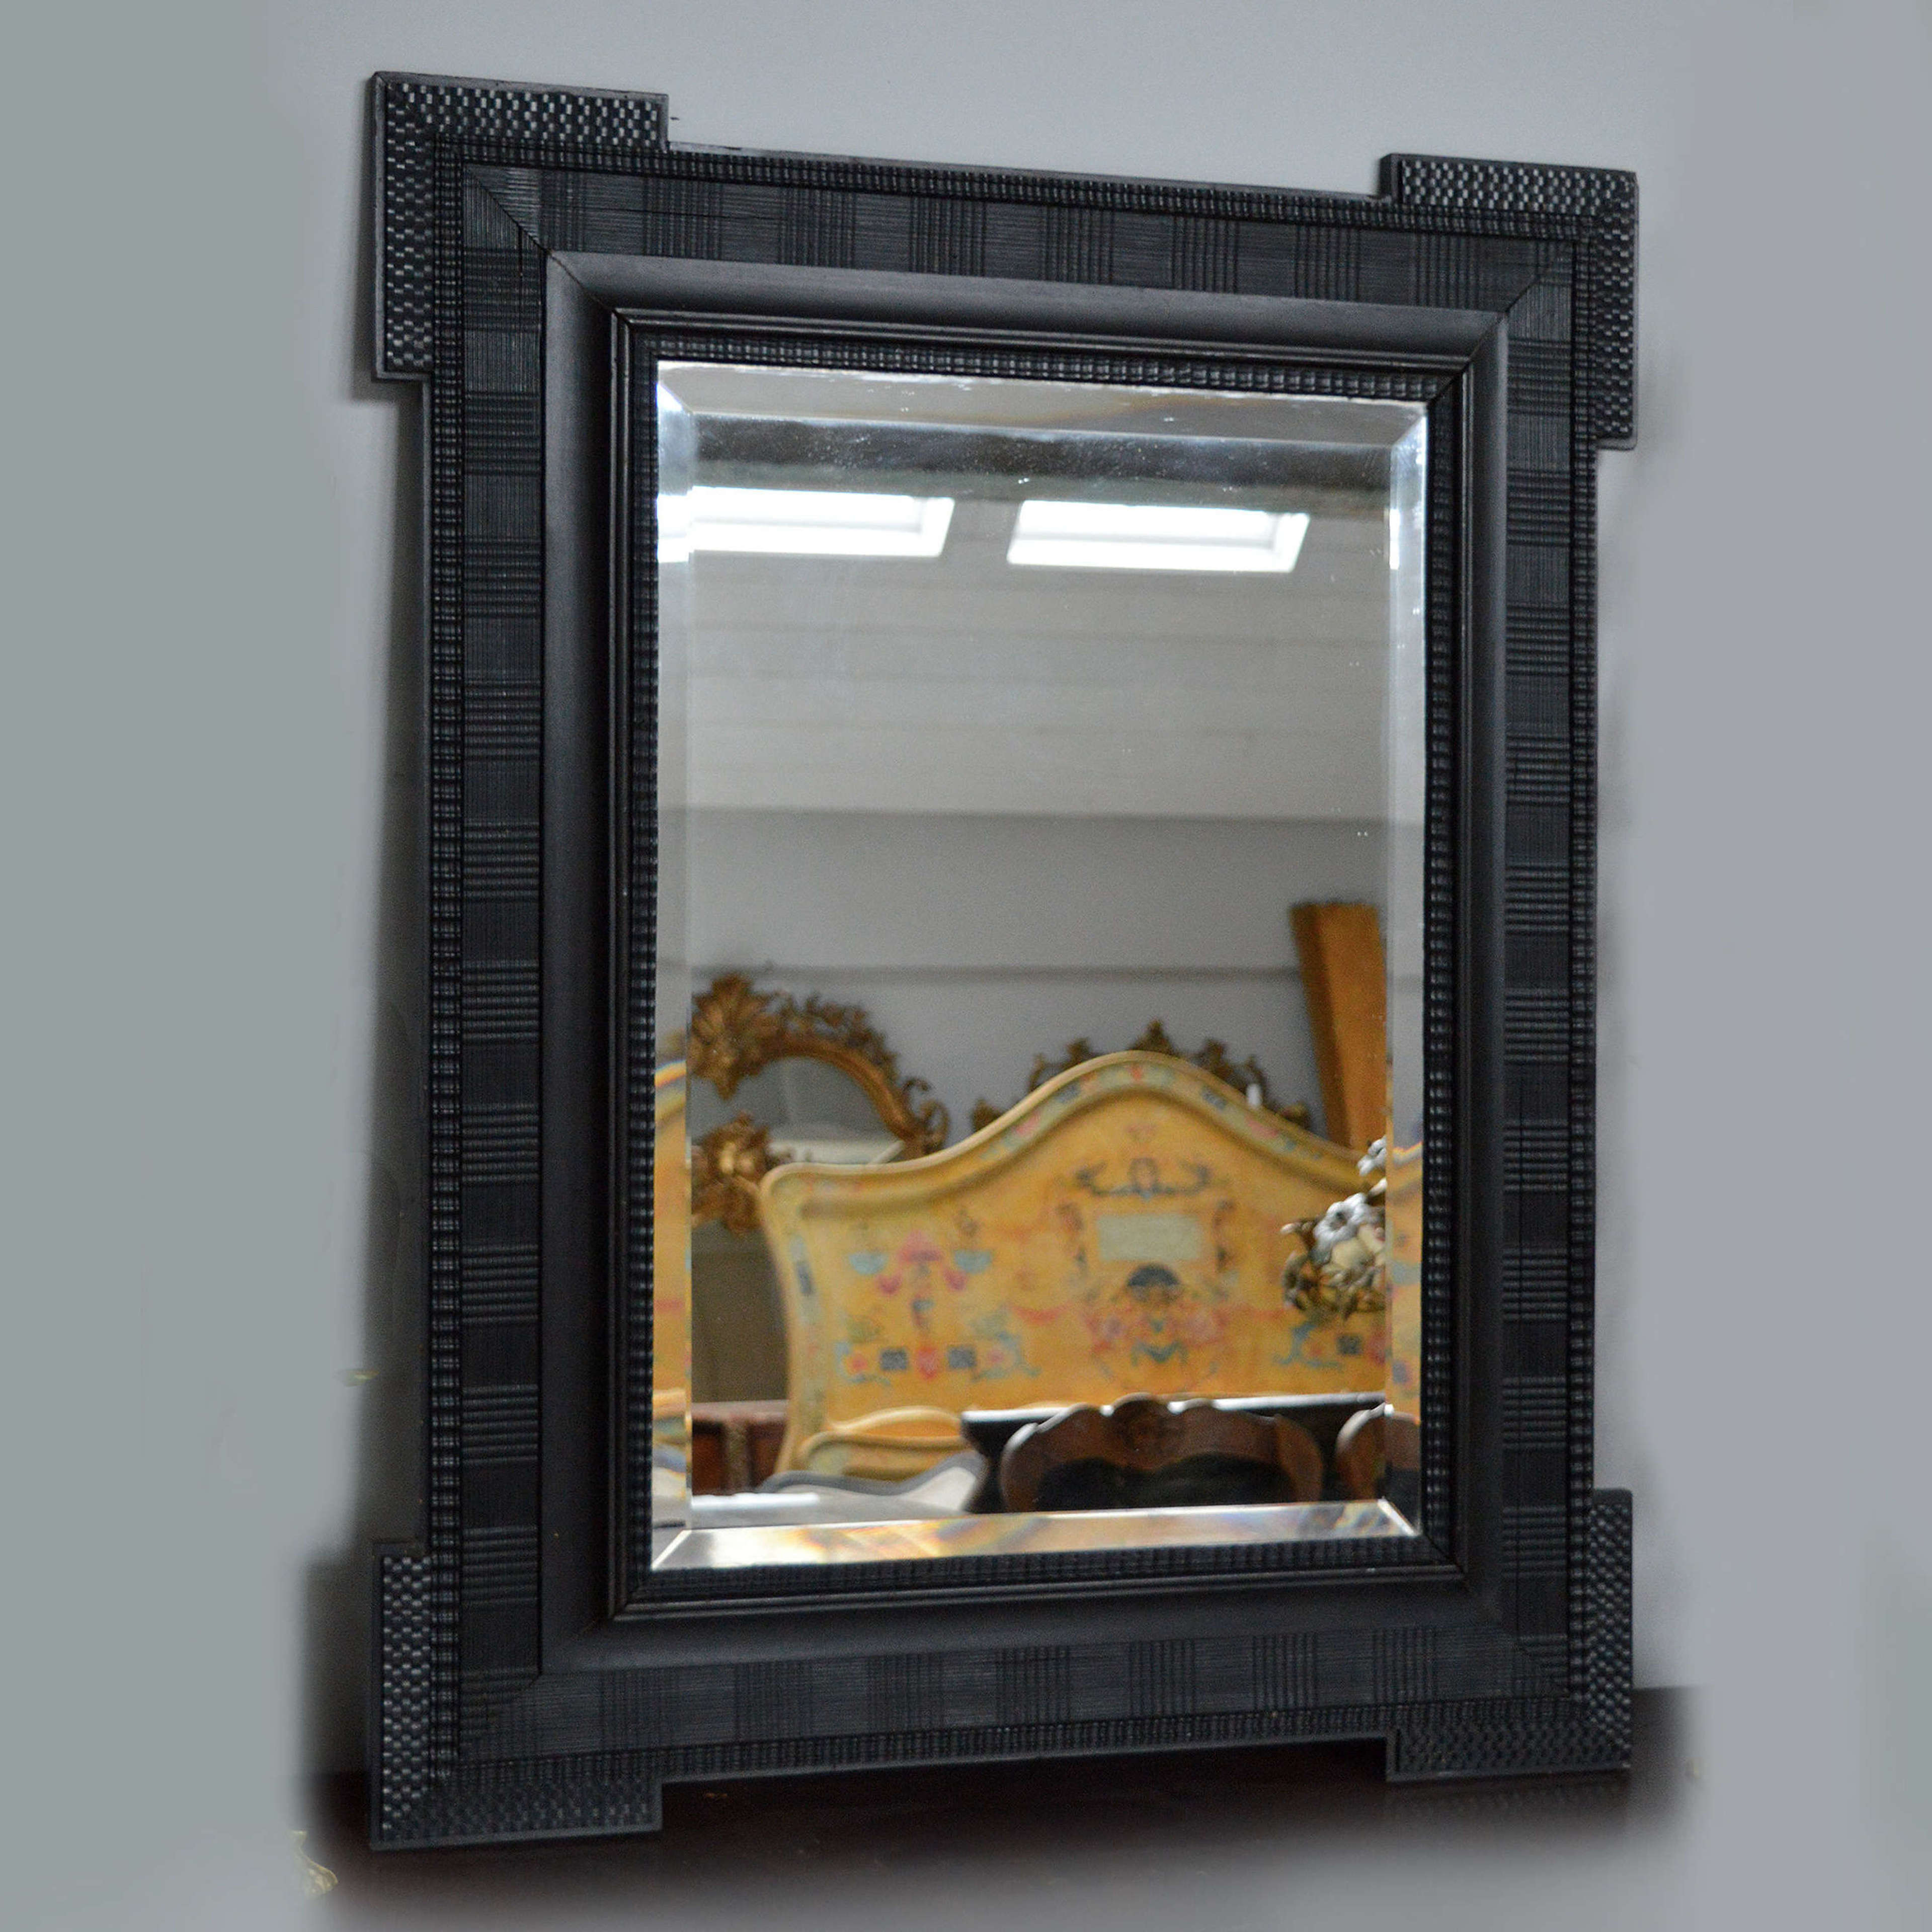 19th Century Dutch Ripple frame mirror